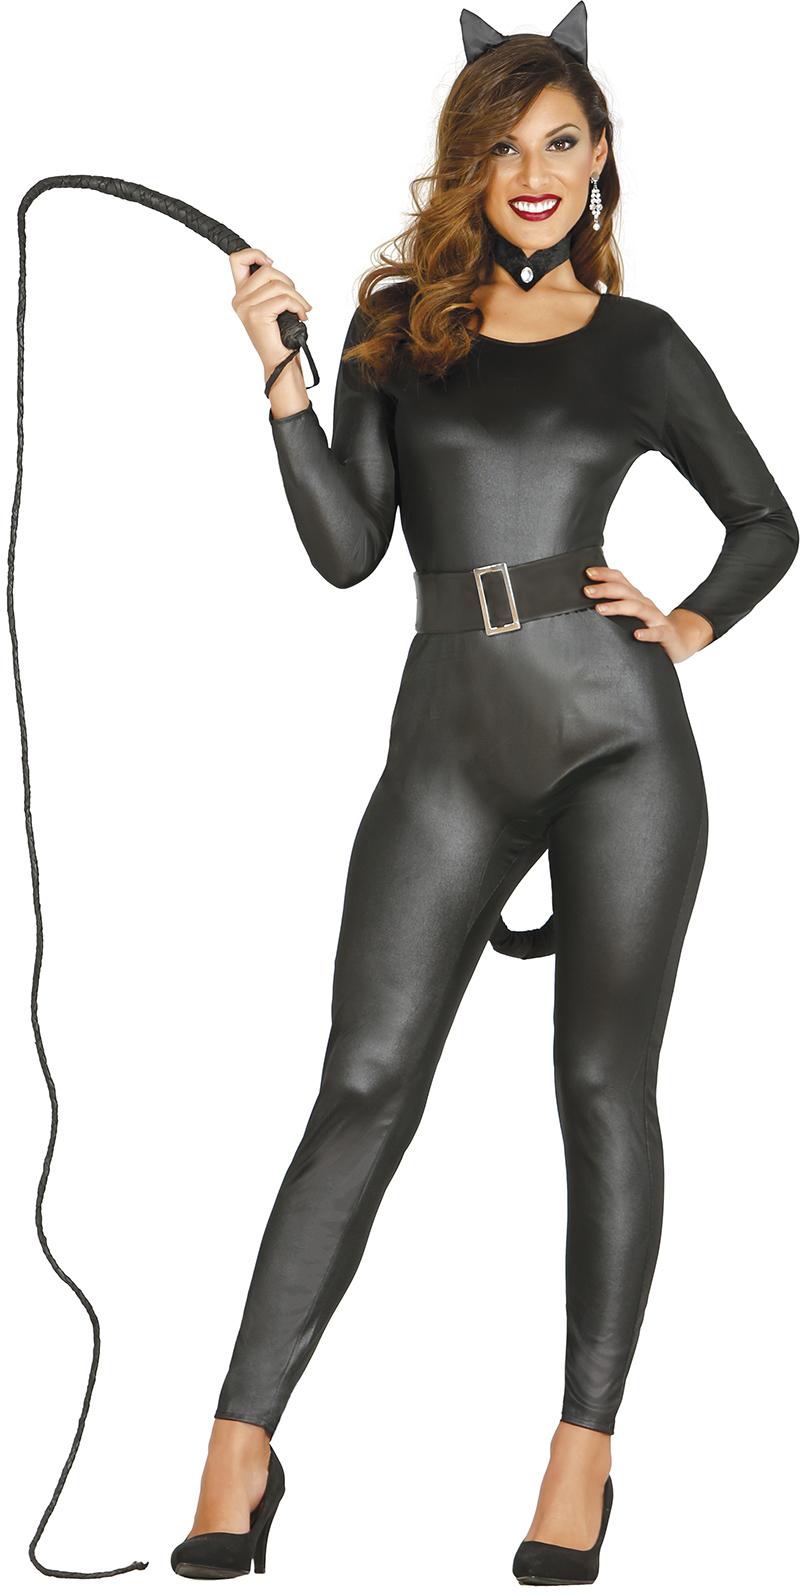 Guirca Kostým Catwoman Velikost - dospělý: M